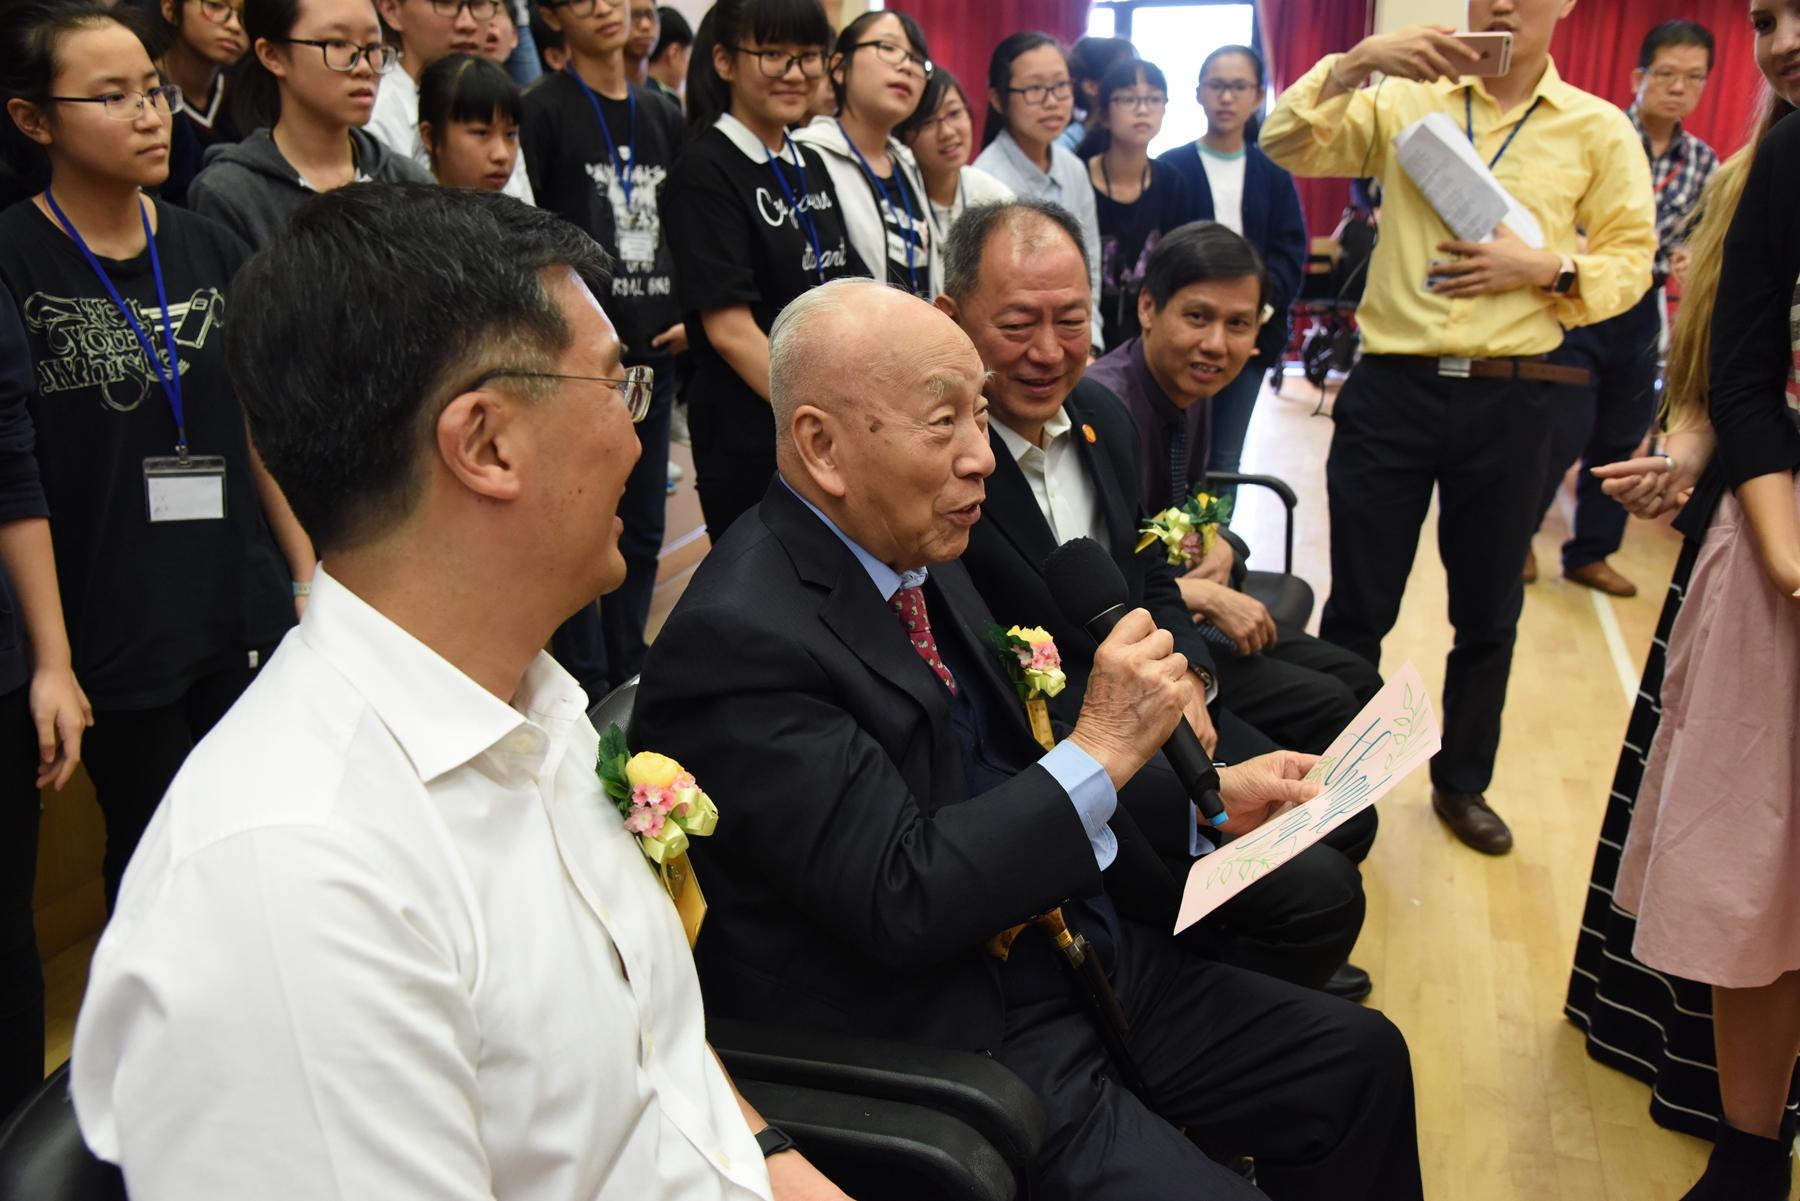 http://www.npc.edu.hk/sites/default/files/dsc_0364_1.jpg